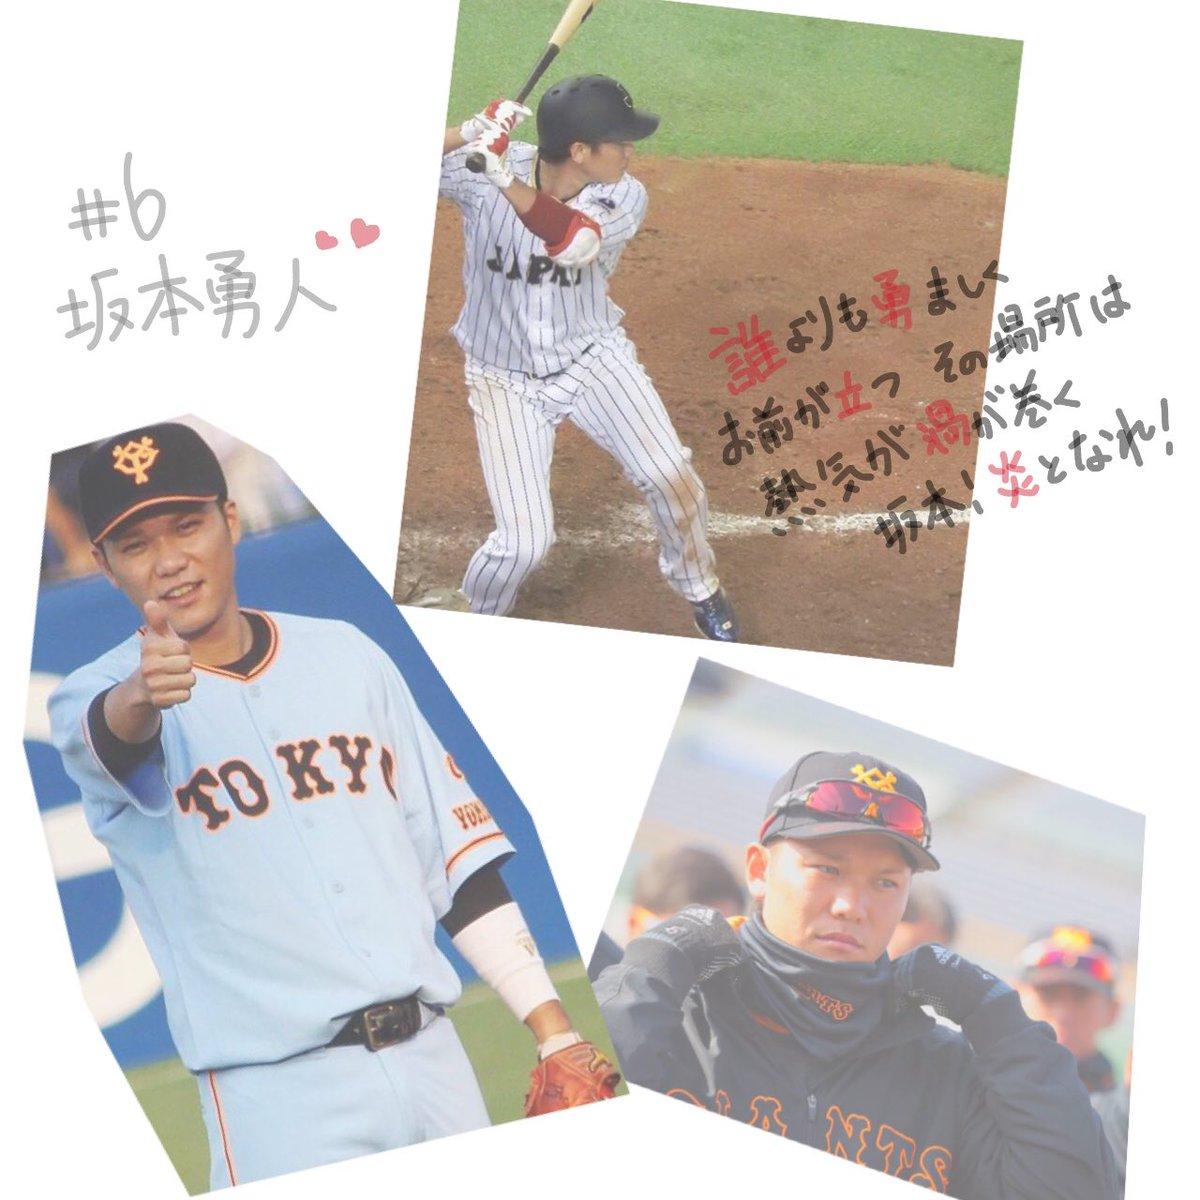 坂本 勇人 twitter